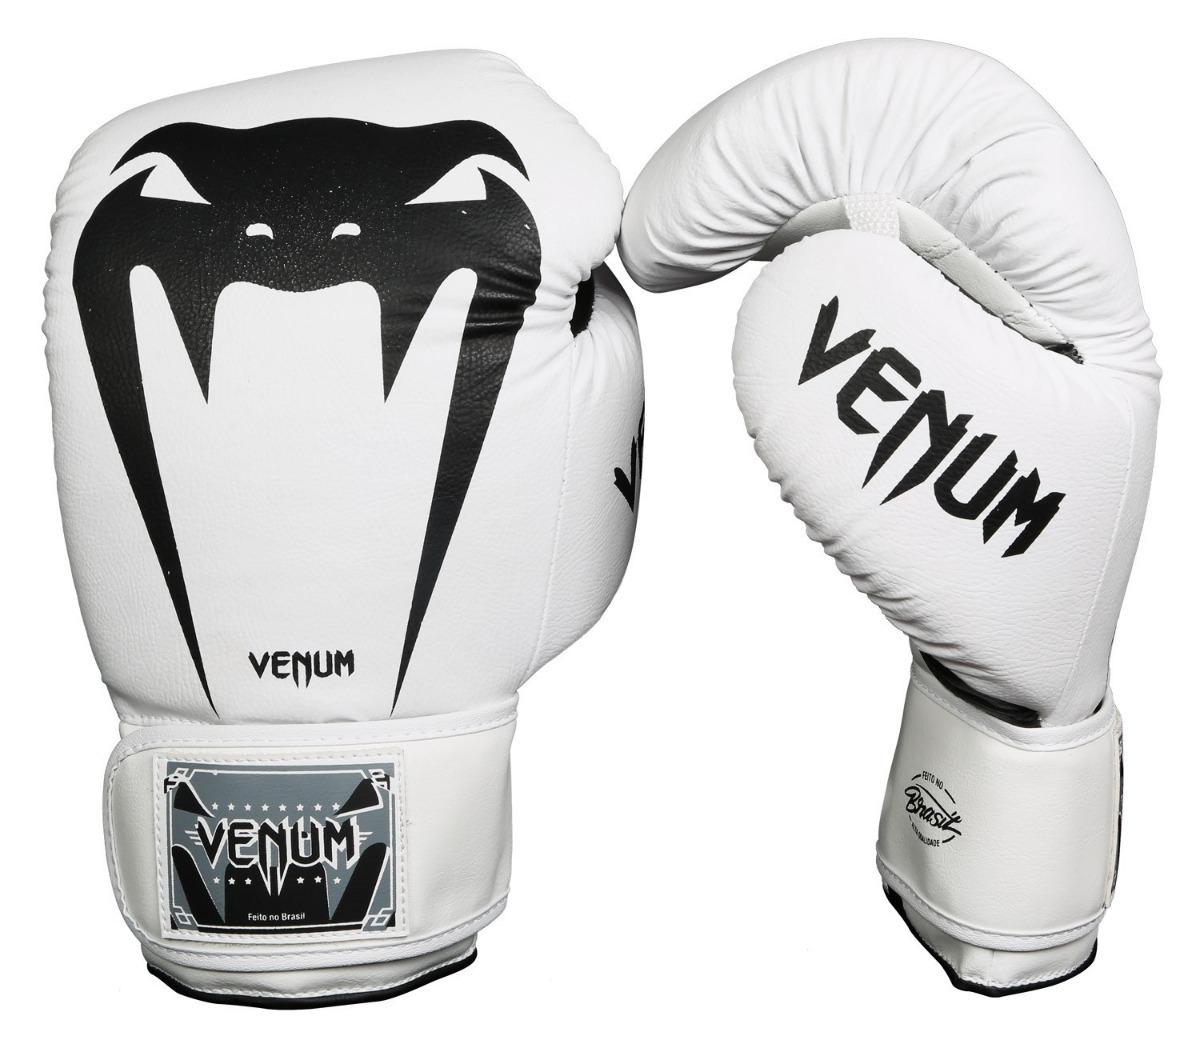 f91c615e1 Luva Boxe muay Thai Venum Giant Brasil Branca Envio Imediato - R  169